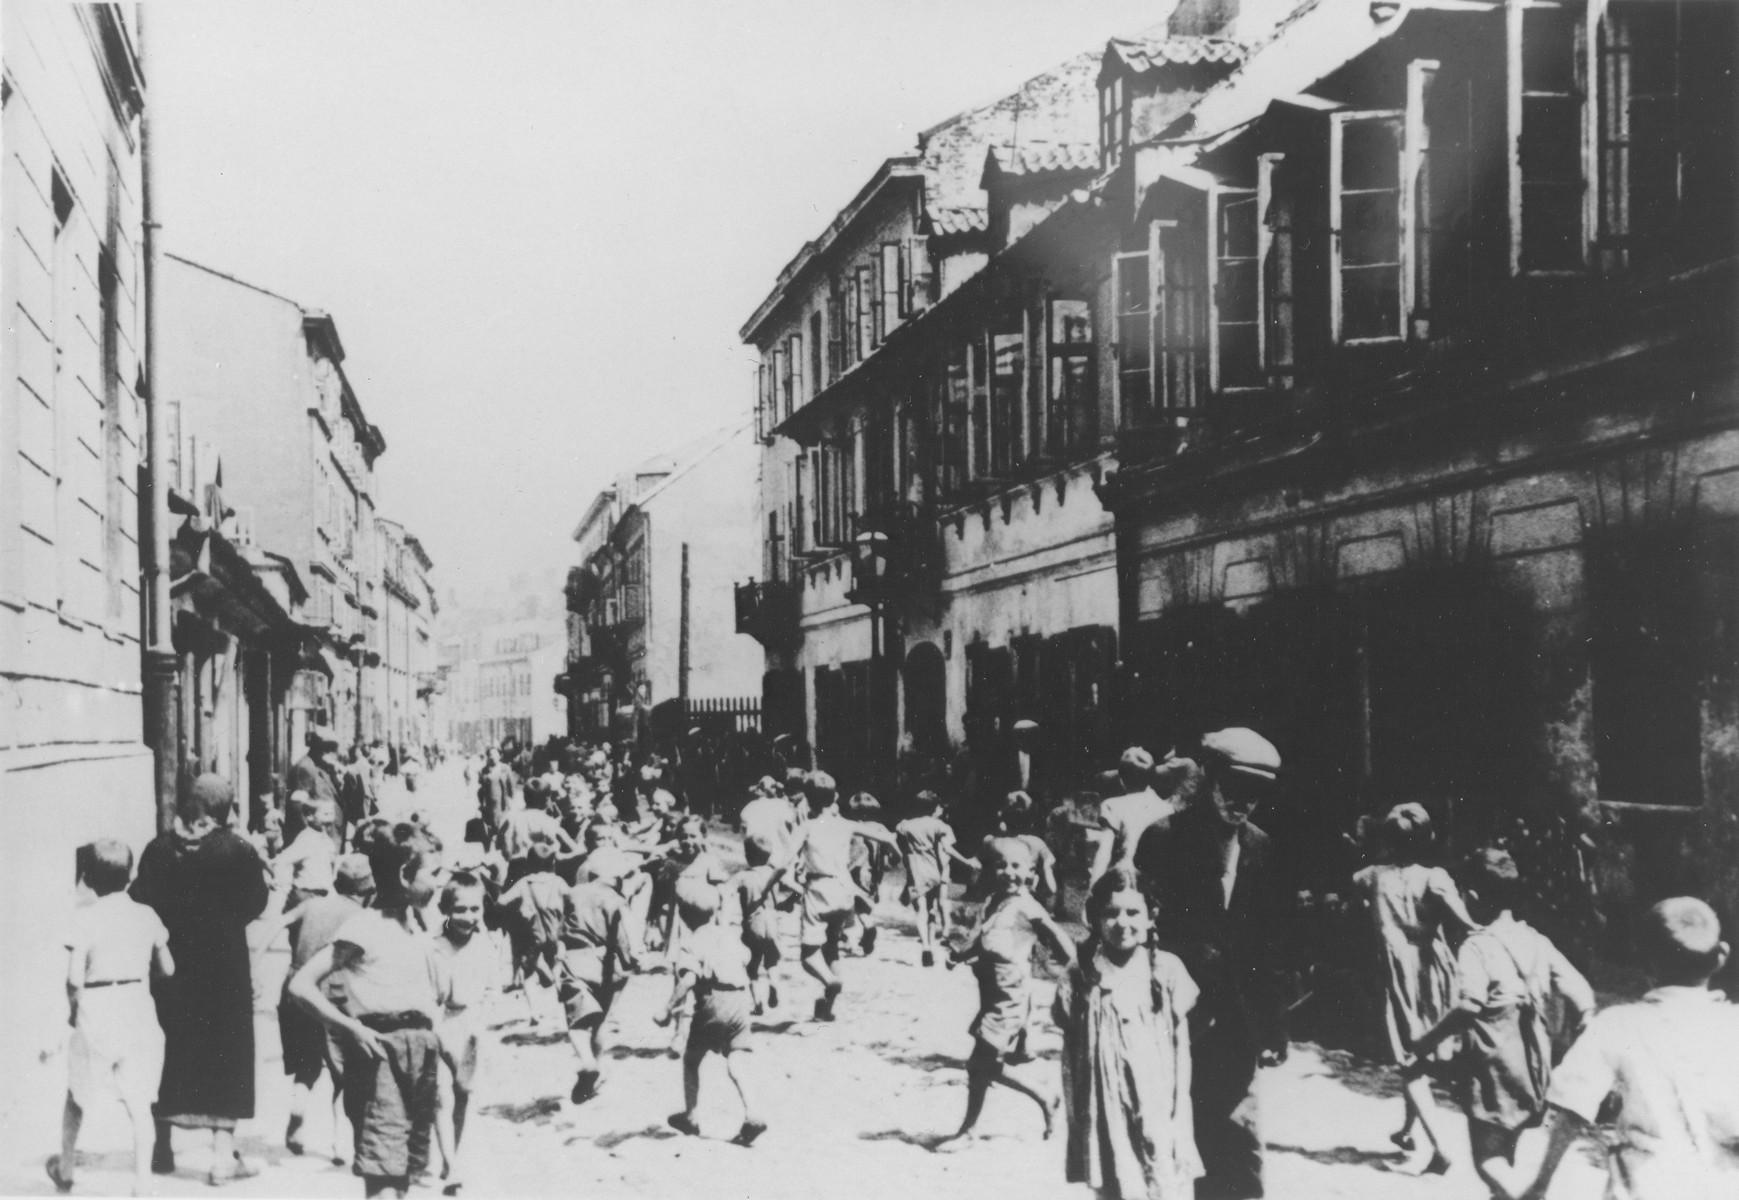 Jewish children playing on Krochmalna Street in the Warsaw ghetto.